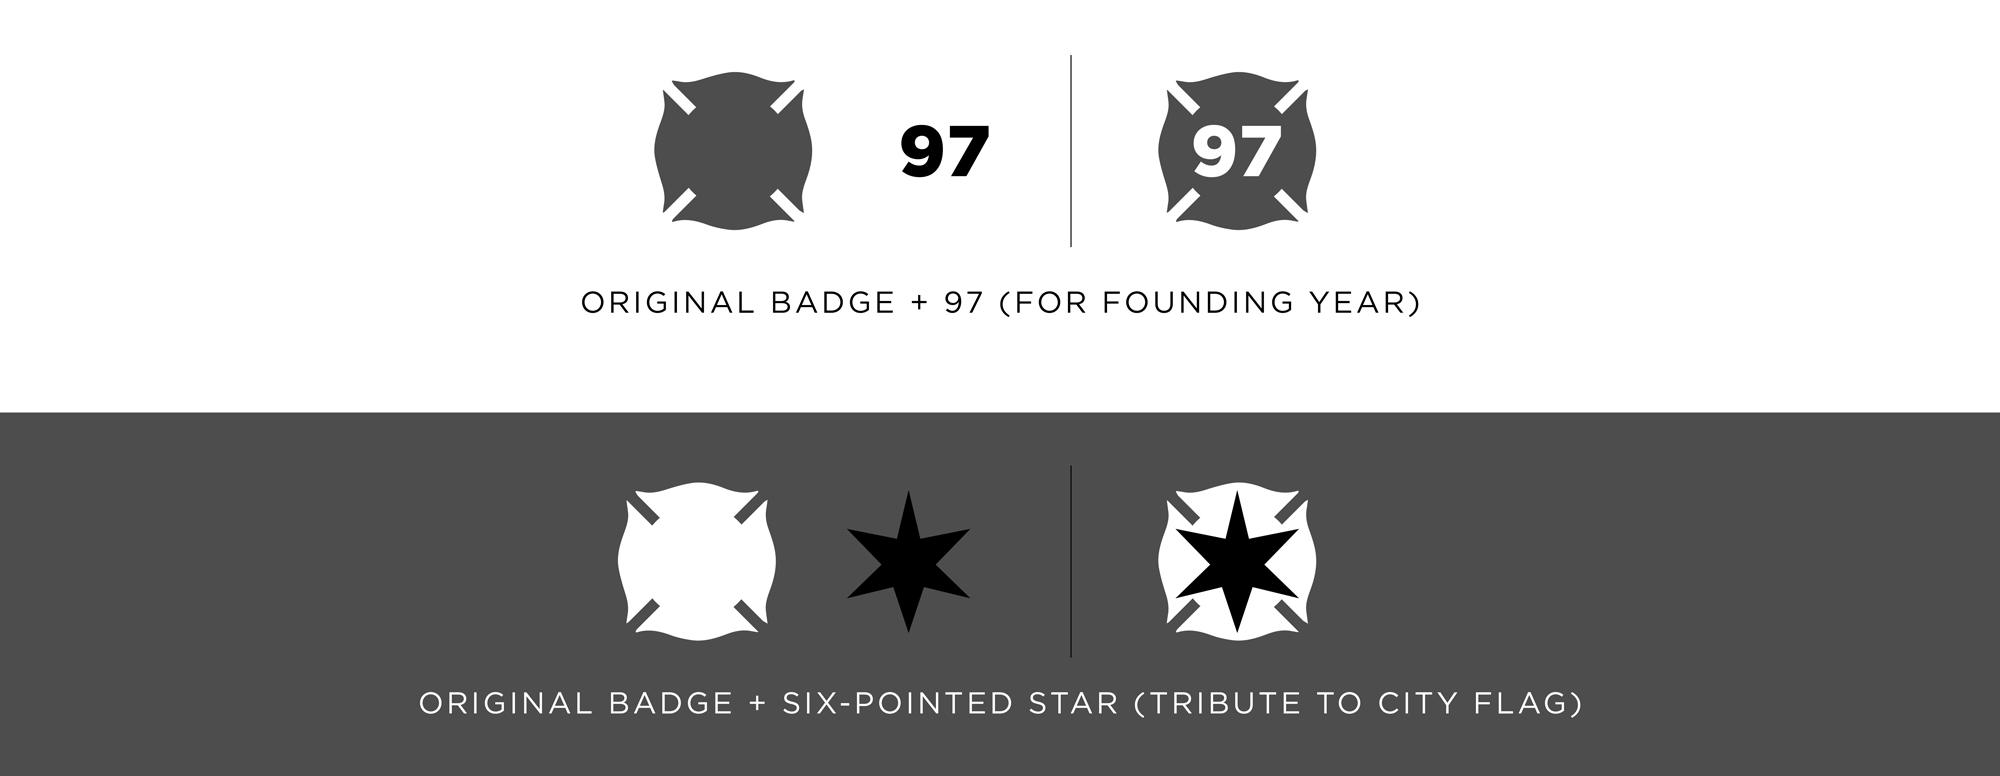 Badge-Tribute.jpg